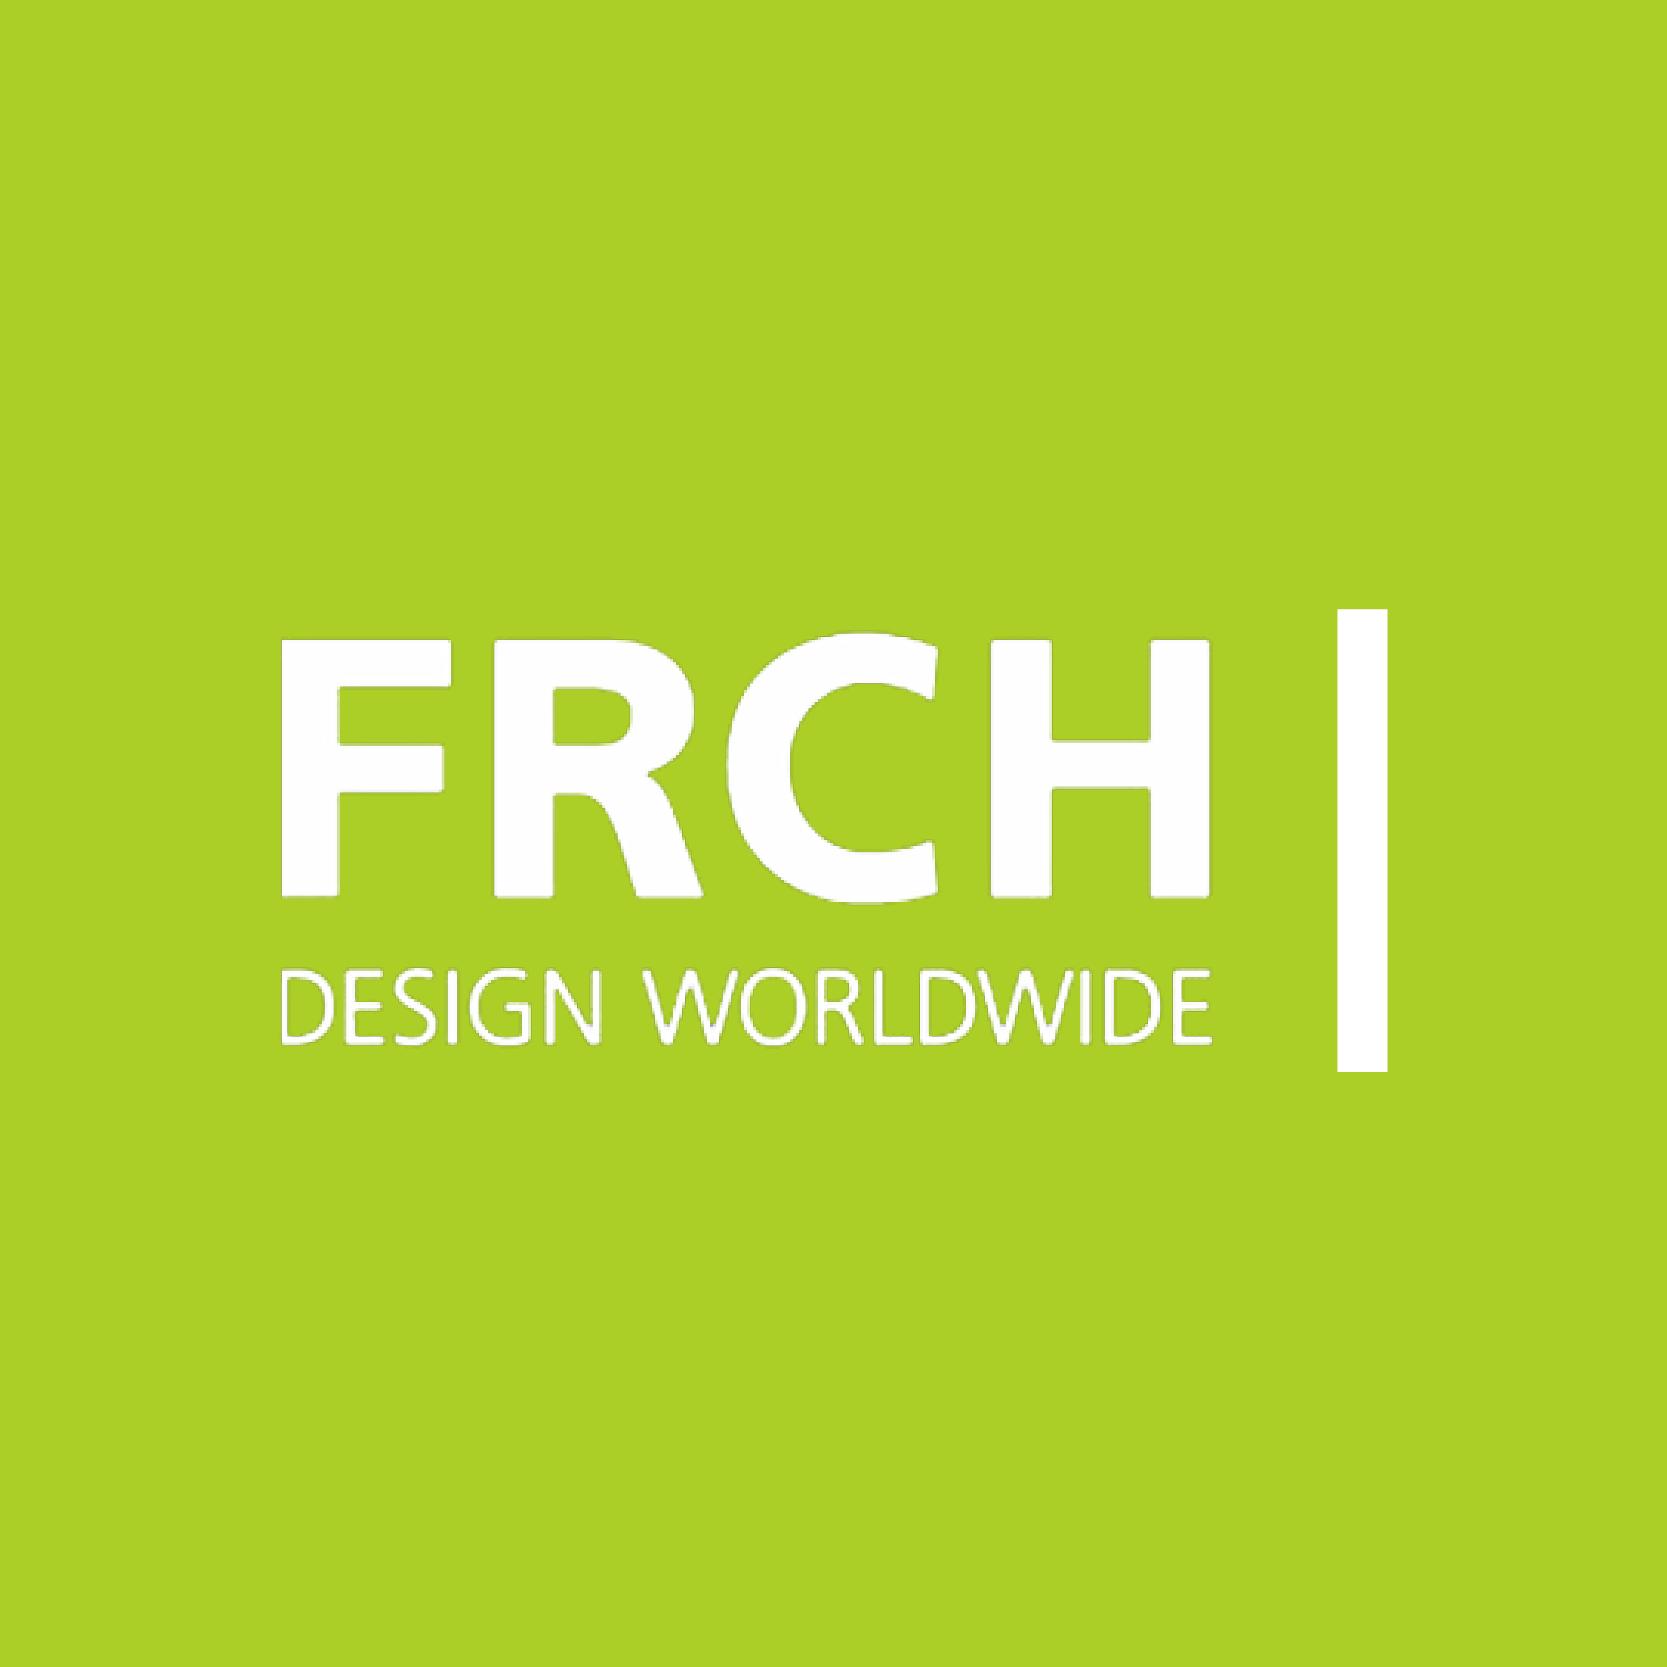 FRCH_SM_logo_400x400.jpg